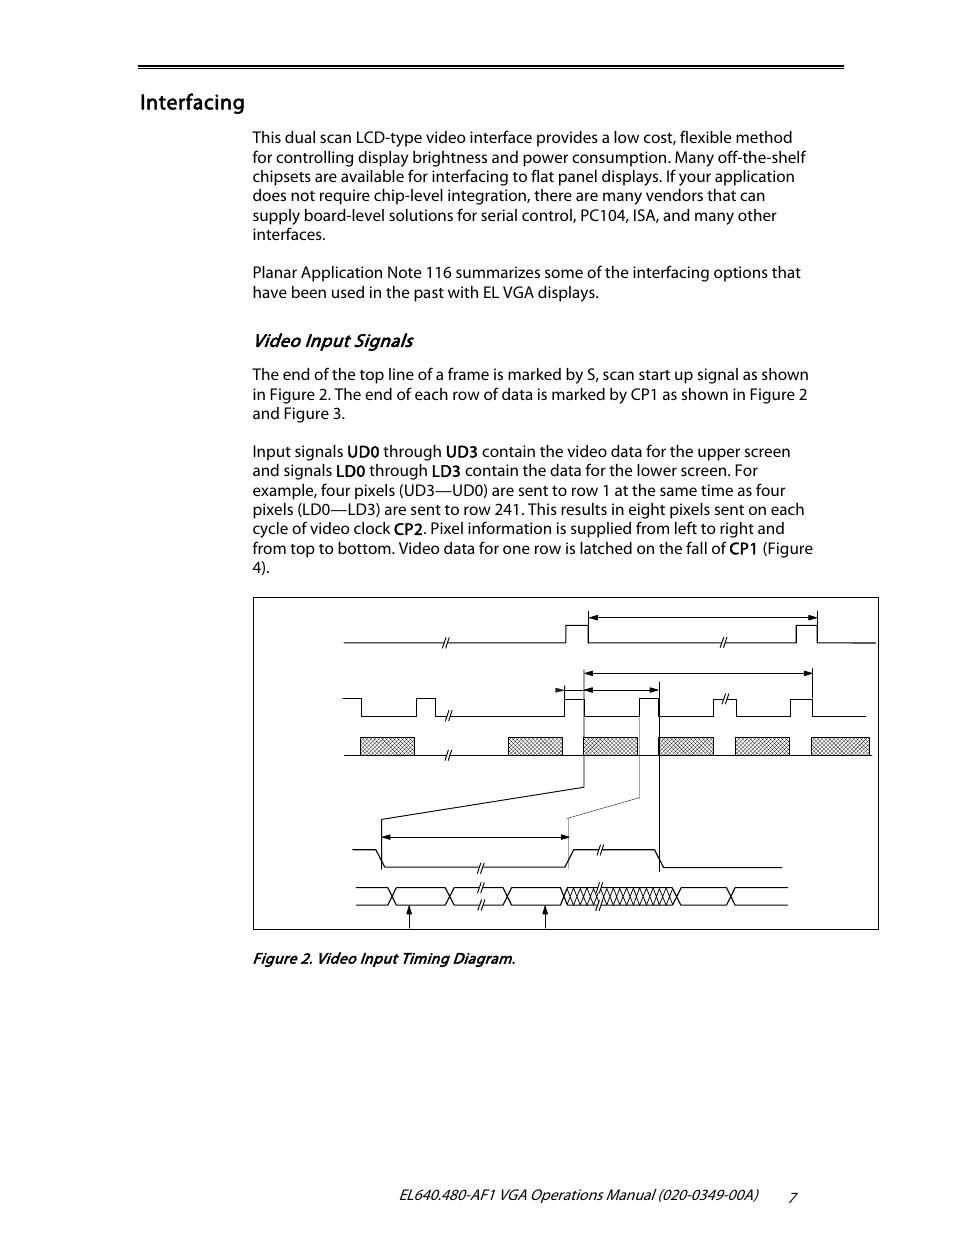 hight resolution of interfacing video input signals planar el640 480 af1 user manual page 9 17